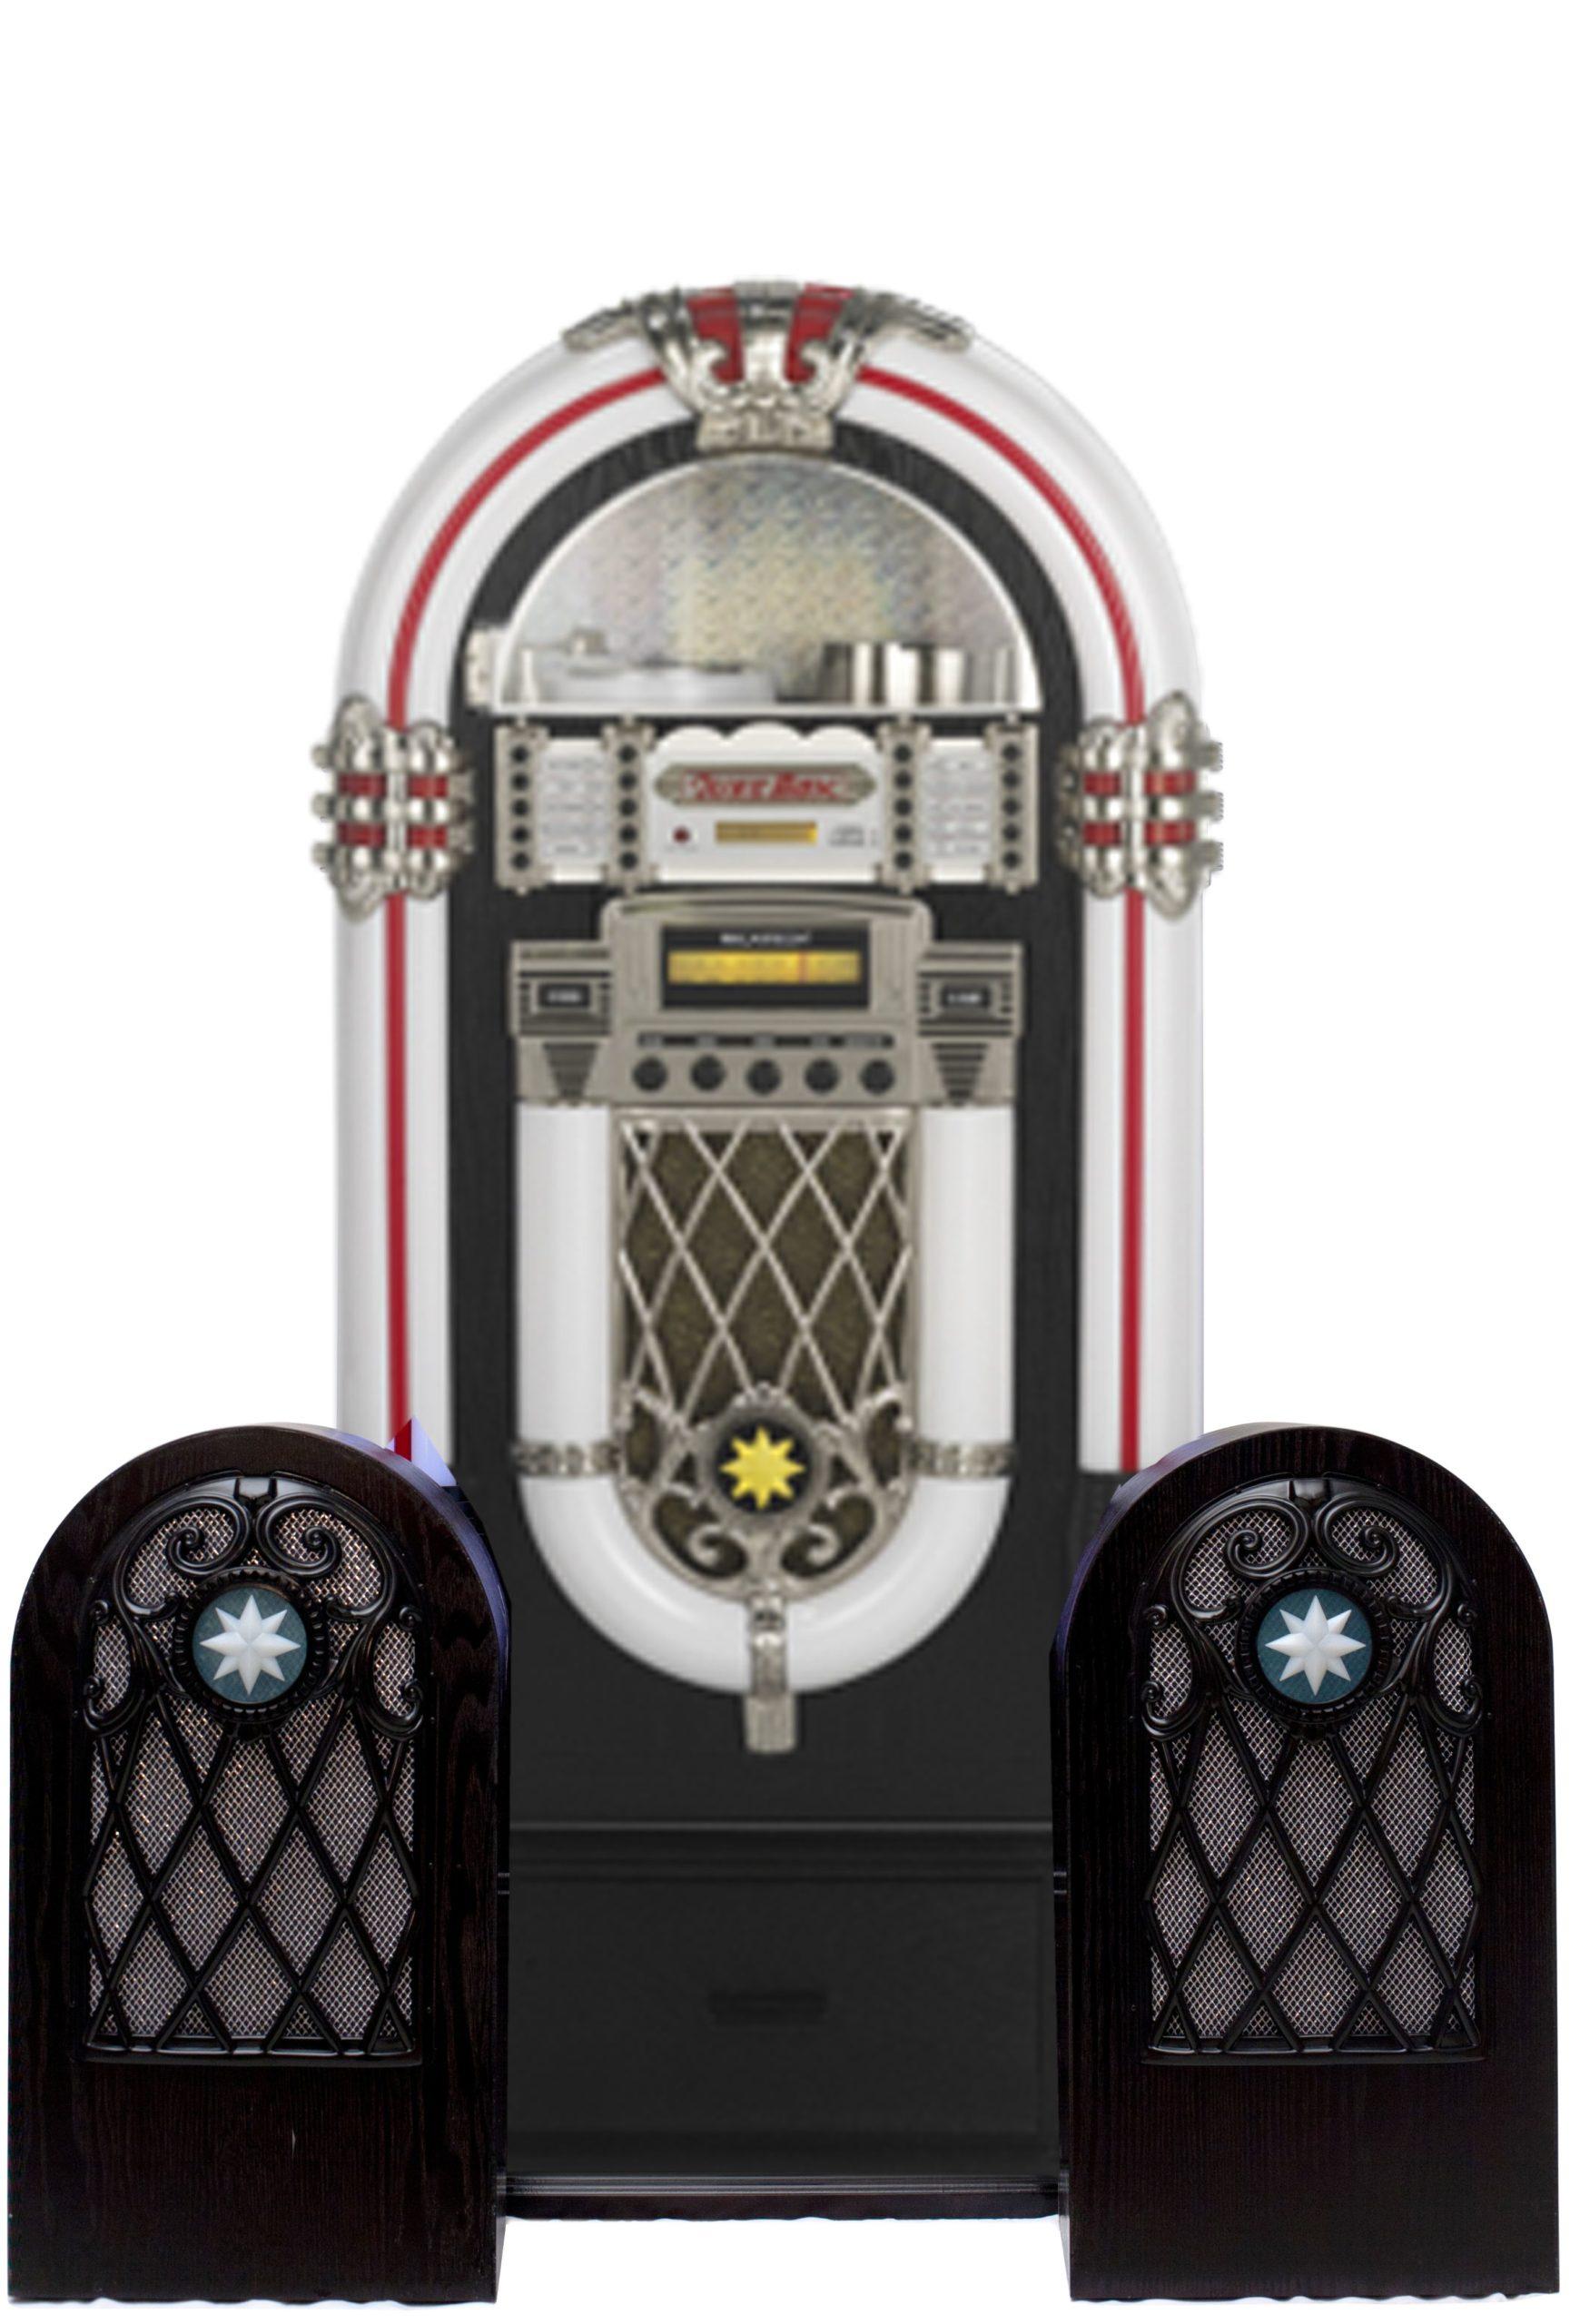 JukeboxBulb2 HQ